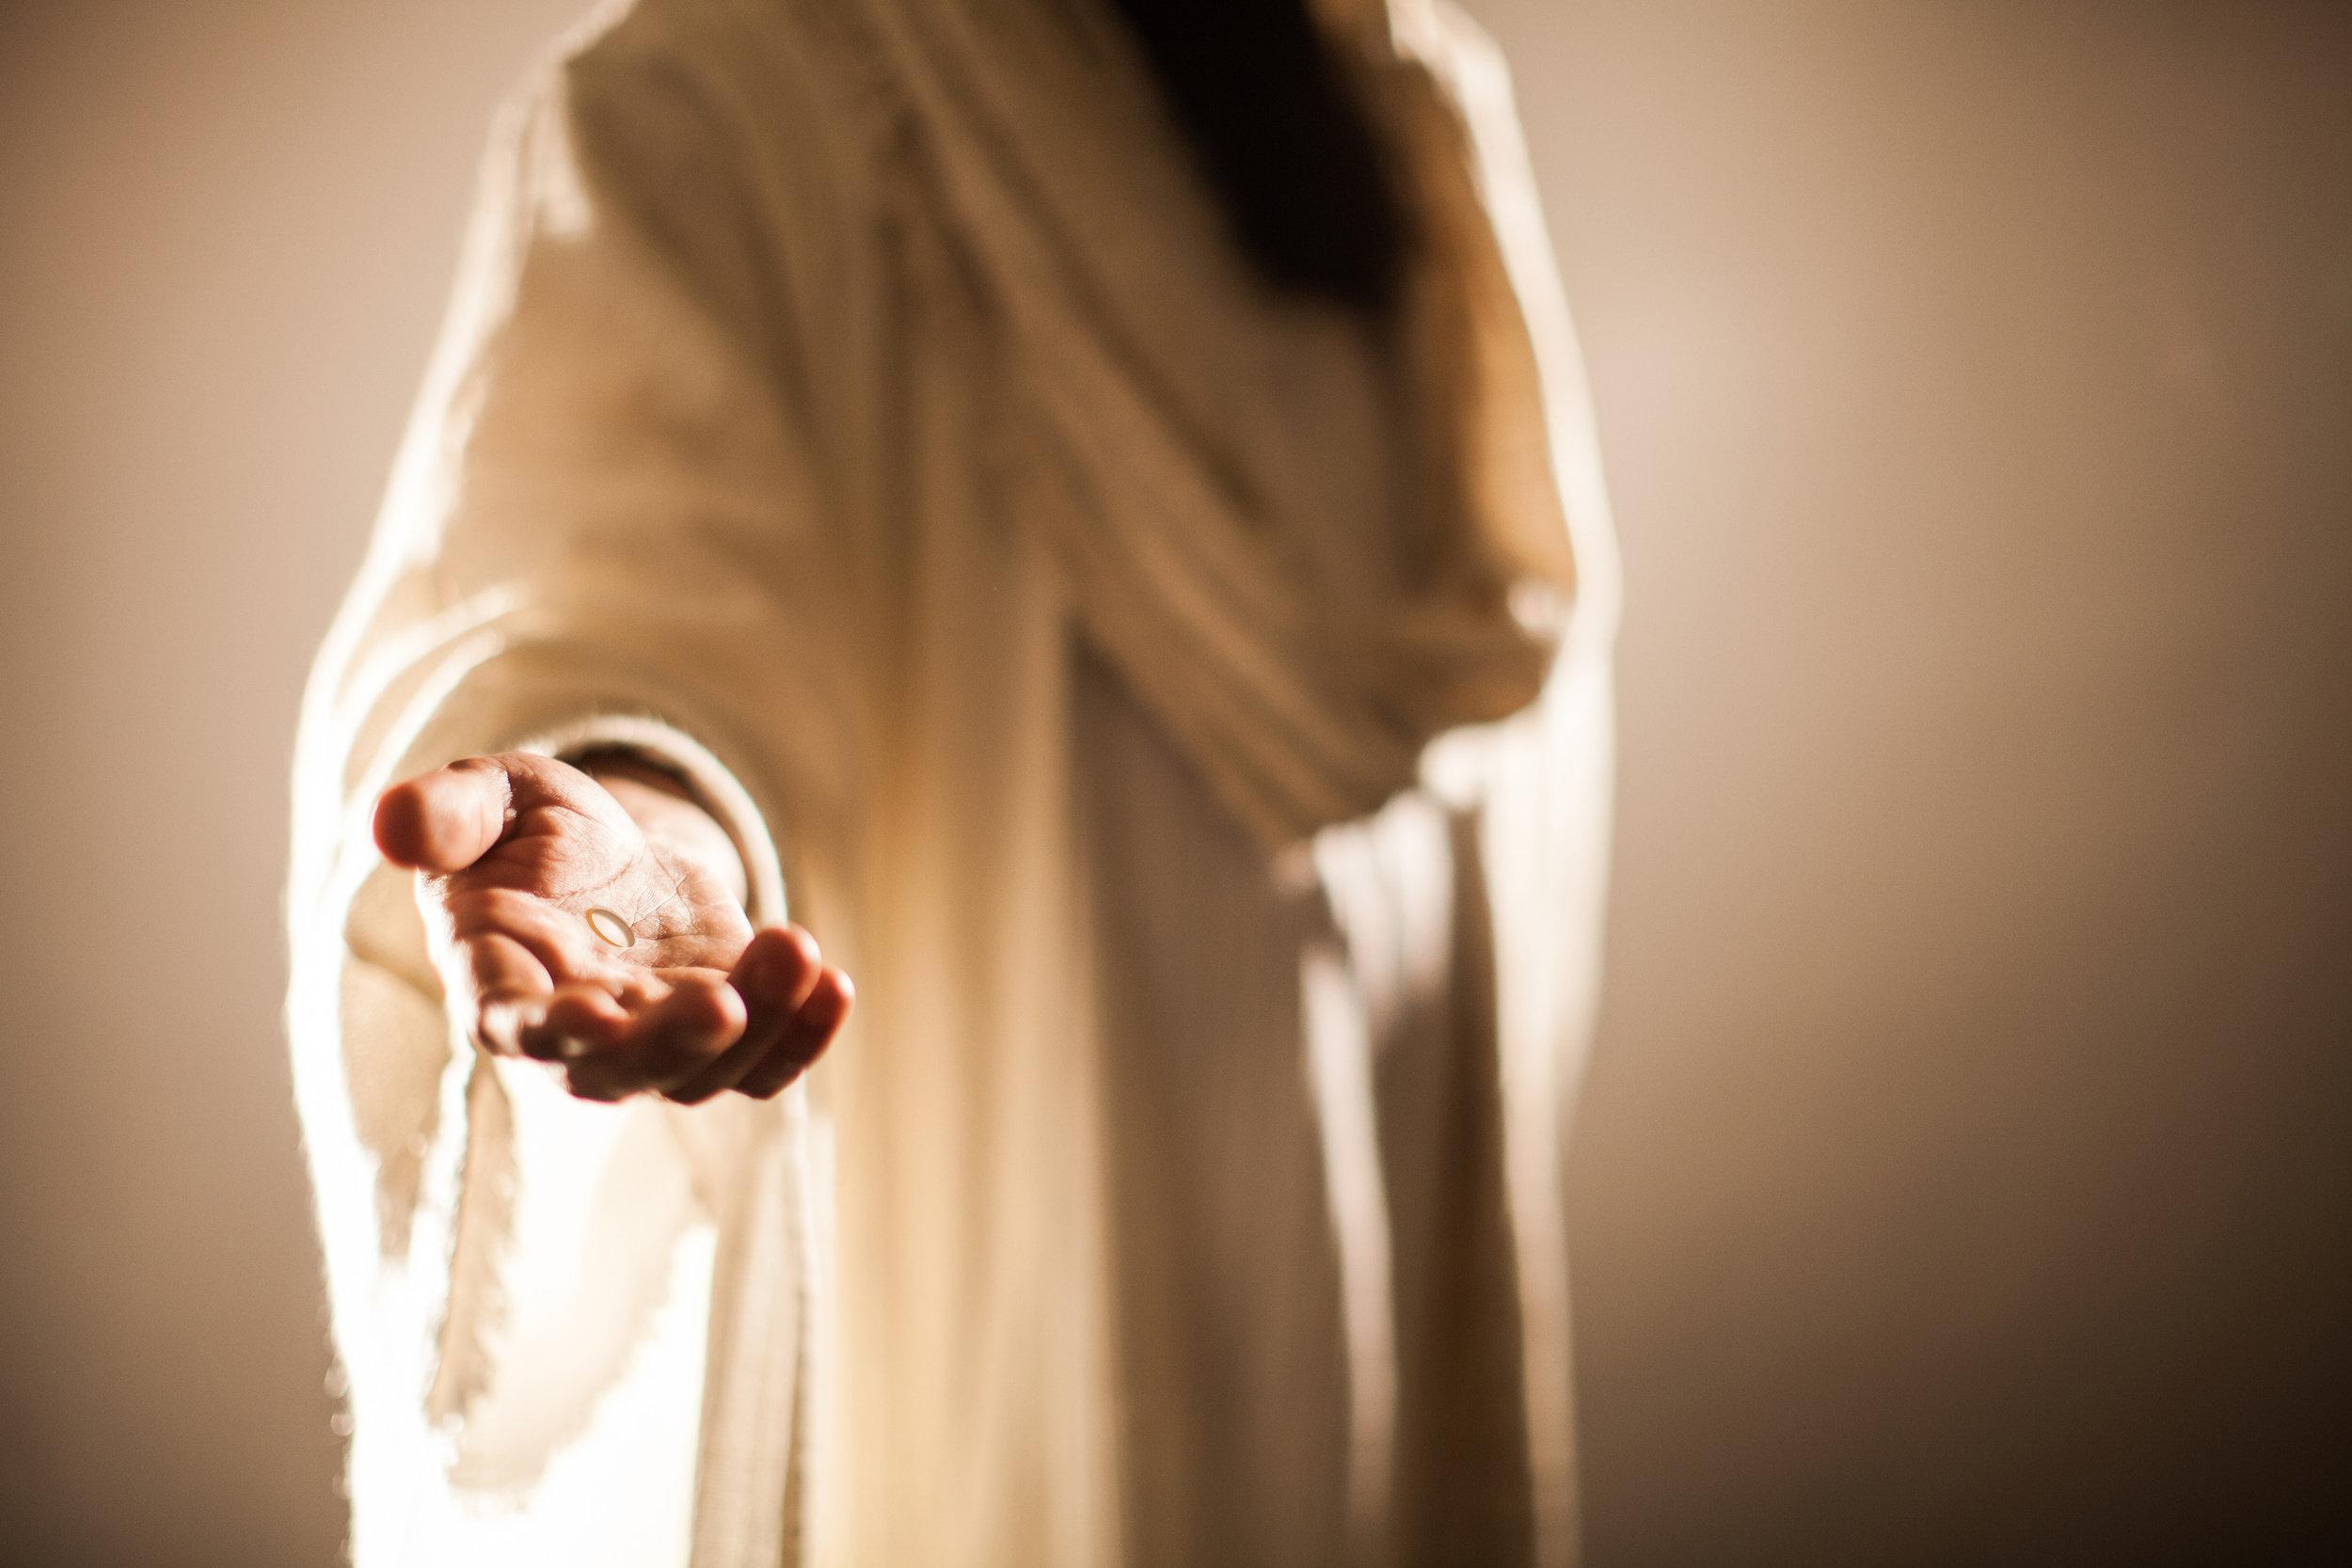 jesus-hand-reaching-out.jpg